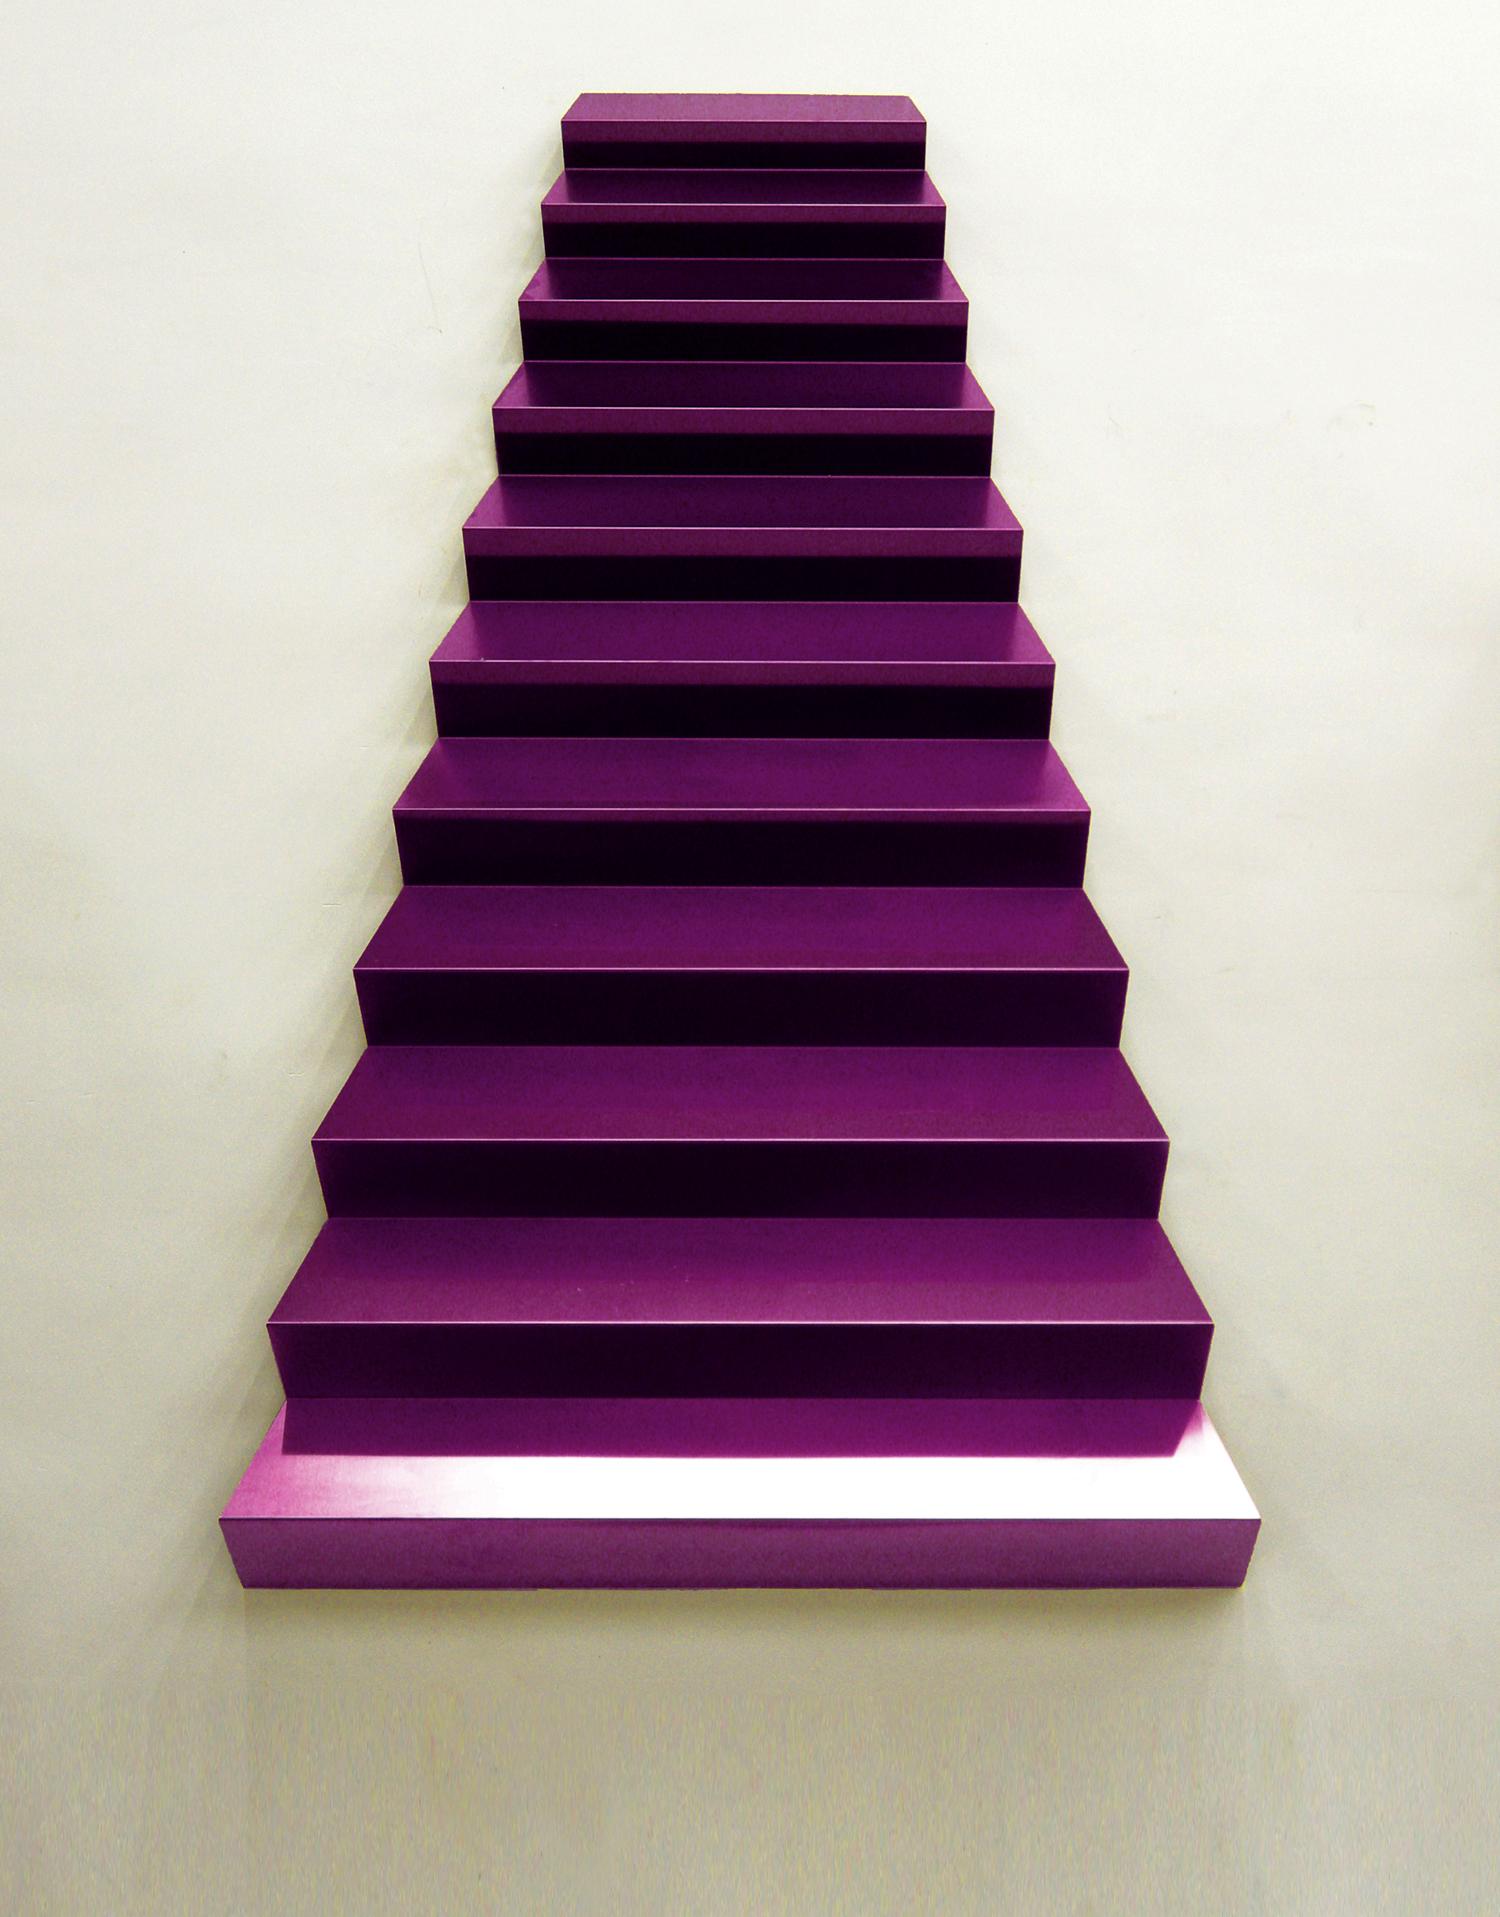 Gao Weigang 高伟刚, Supersturcture 上层建筑, 2011, Stainless steel and titanium 不锈钢、钛金, 180 x 120 x 12.5cm